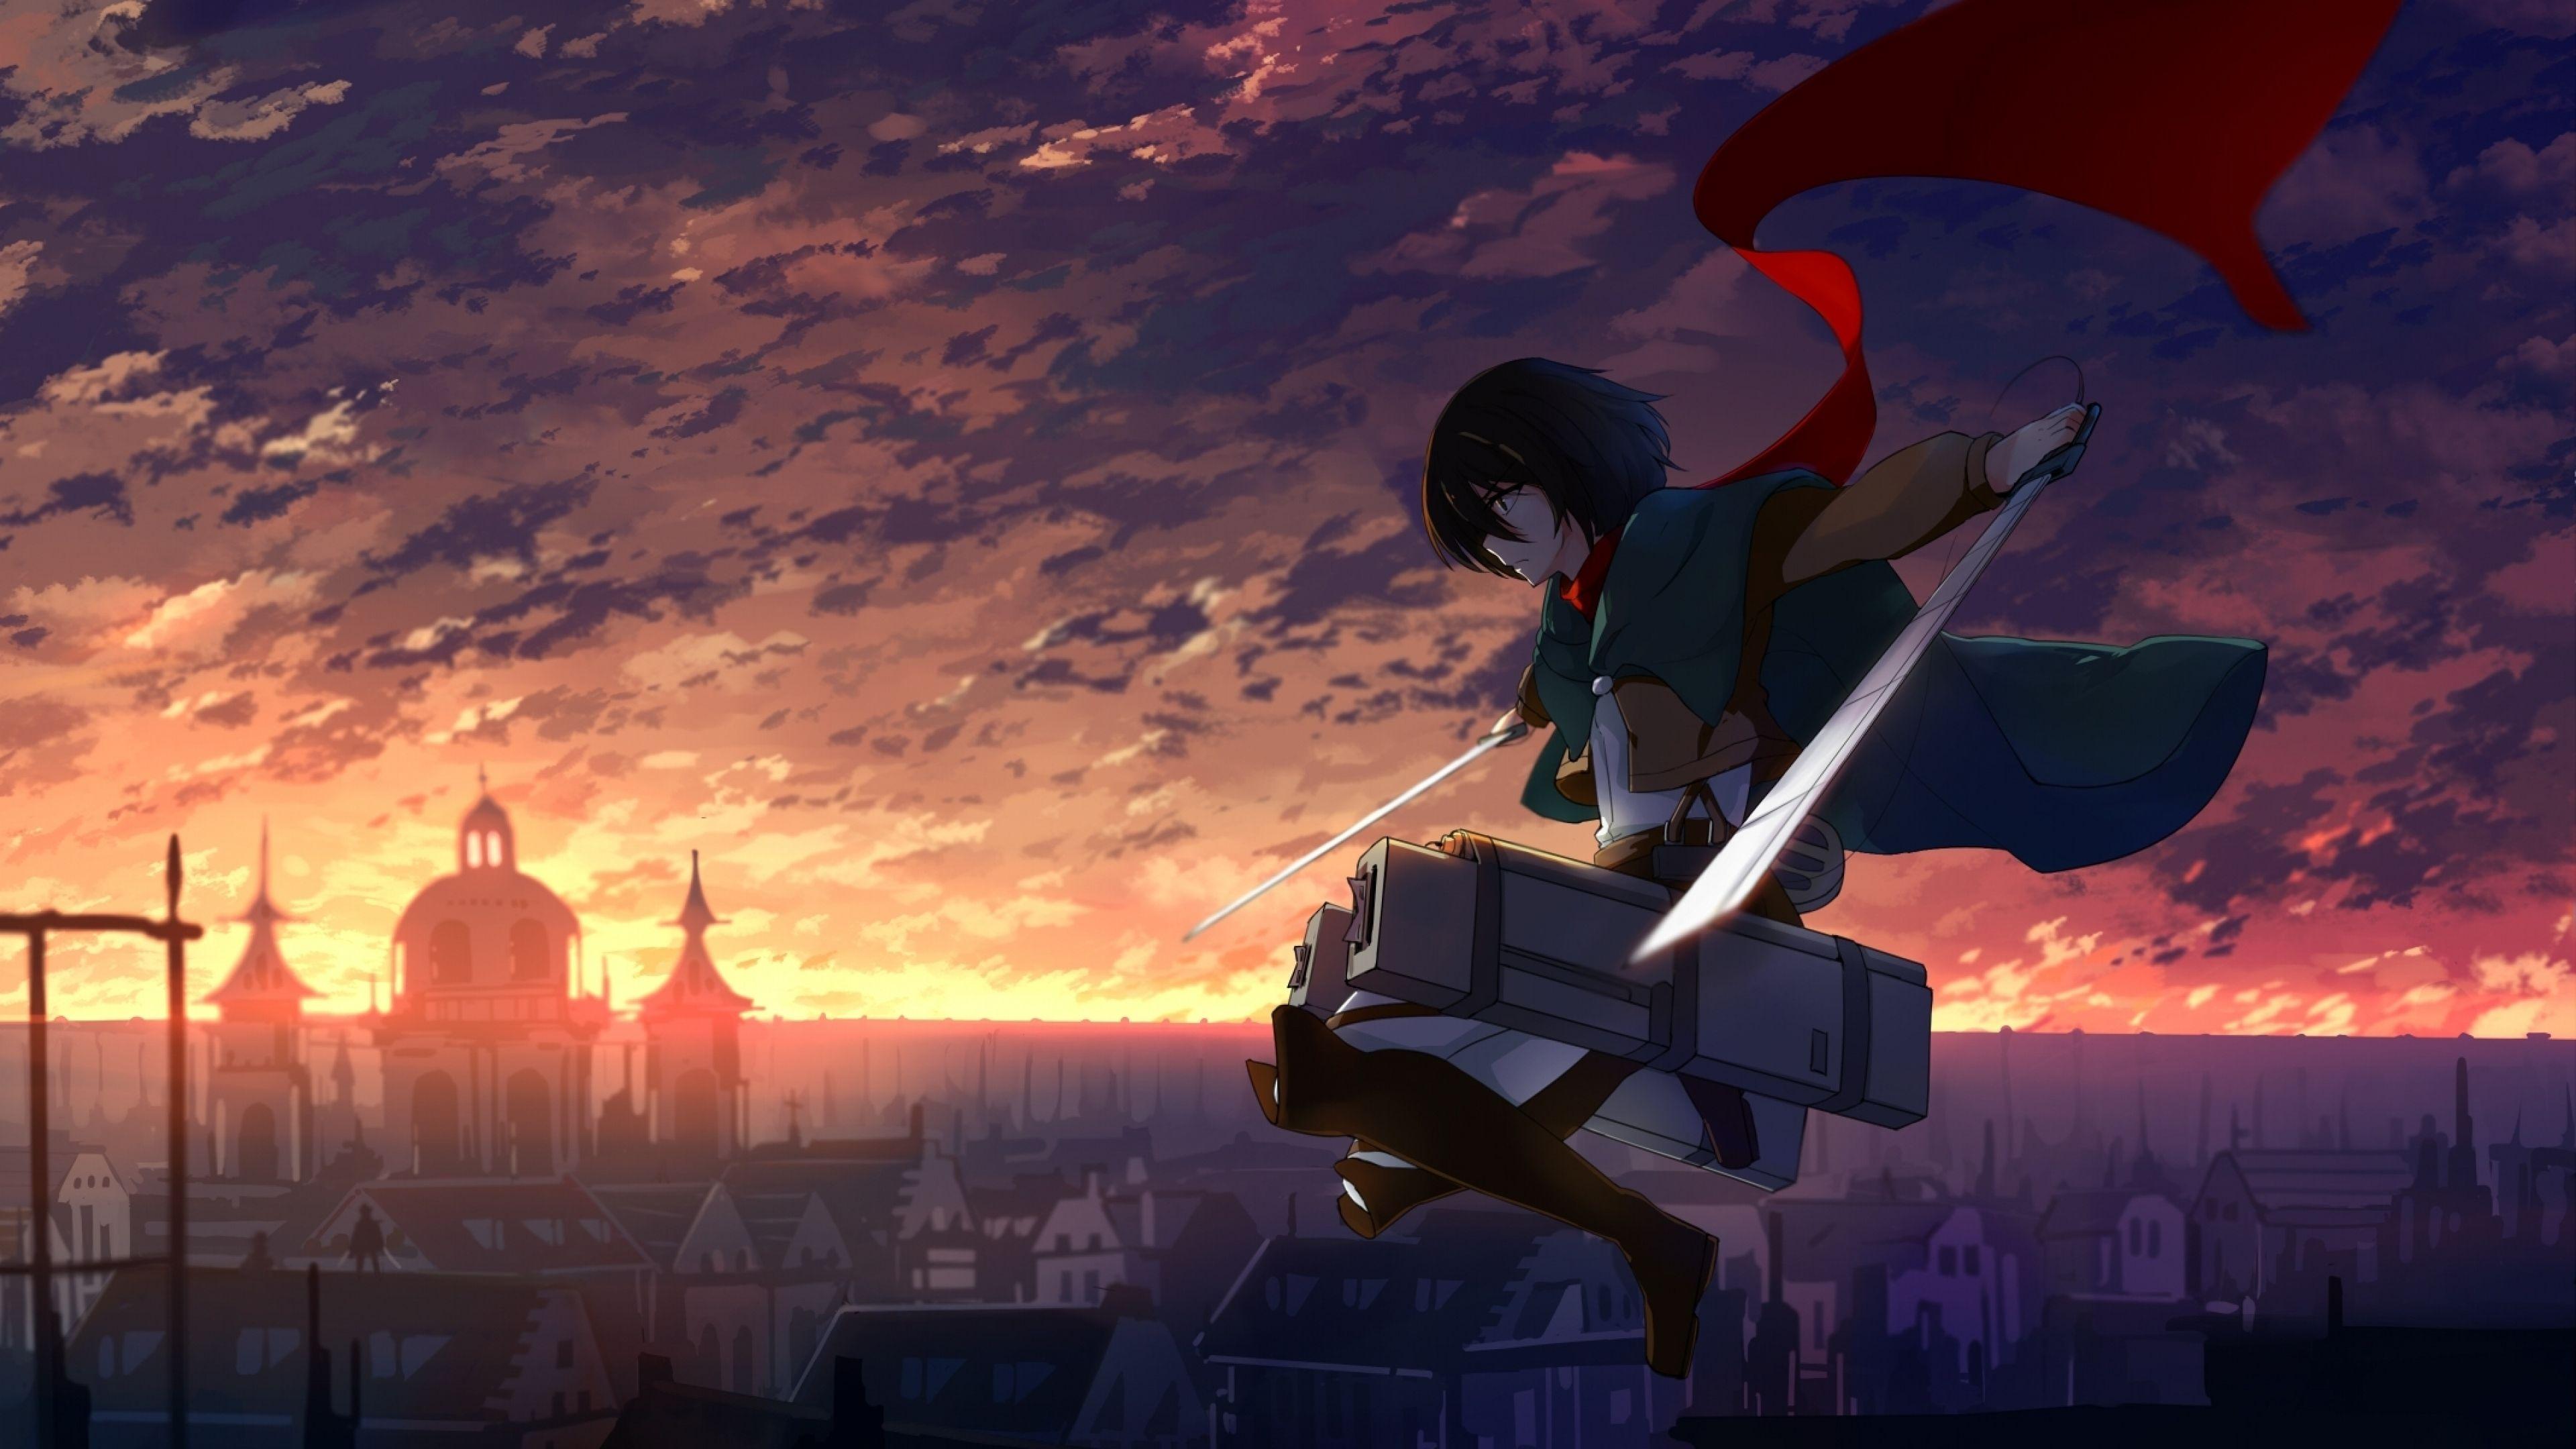 3840x2160 Wallpaper Anime Shingeki No Kyojin Mikasa Ackerman En 2021 Wallpapers 4k Para Pc Anime Sunset Kyojin